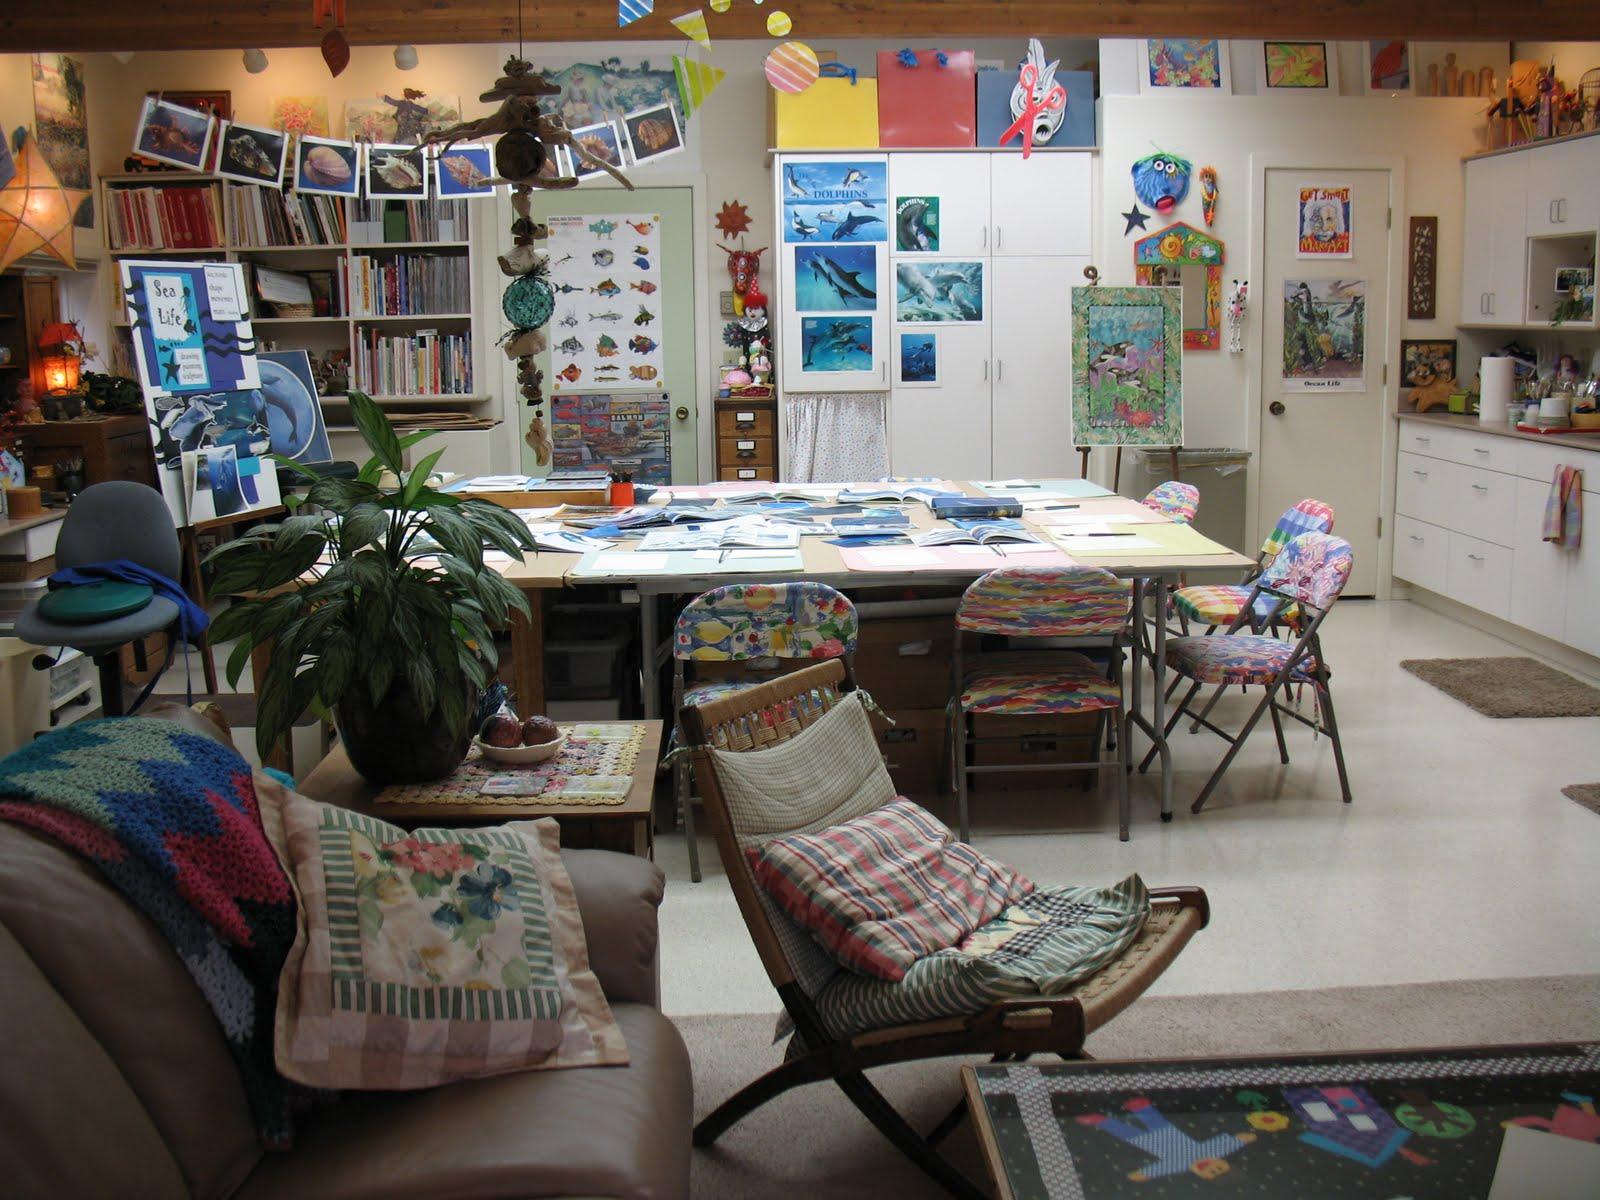 home art studio design ideas interior design ideas. Black Bedroom Furniture Sets. Home Design Ideas